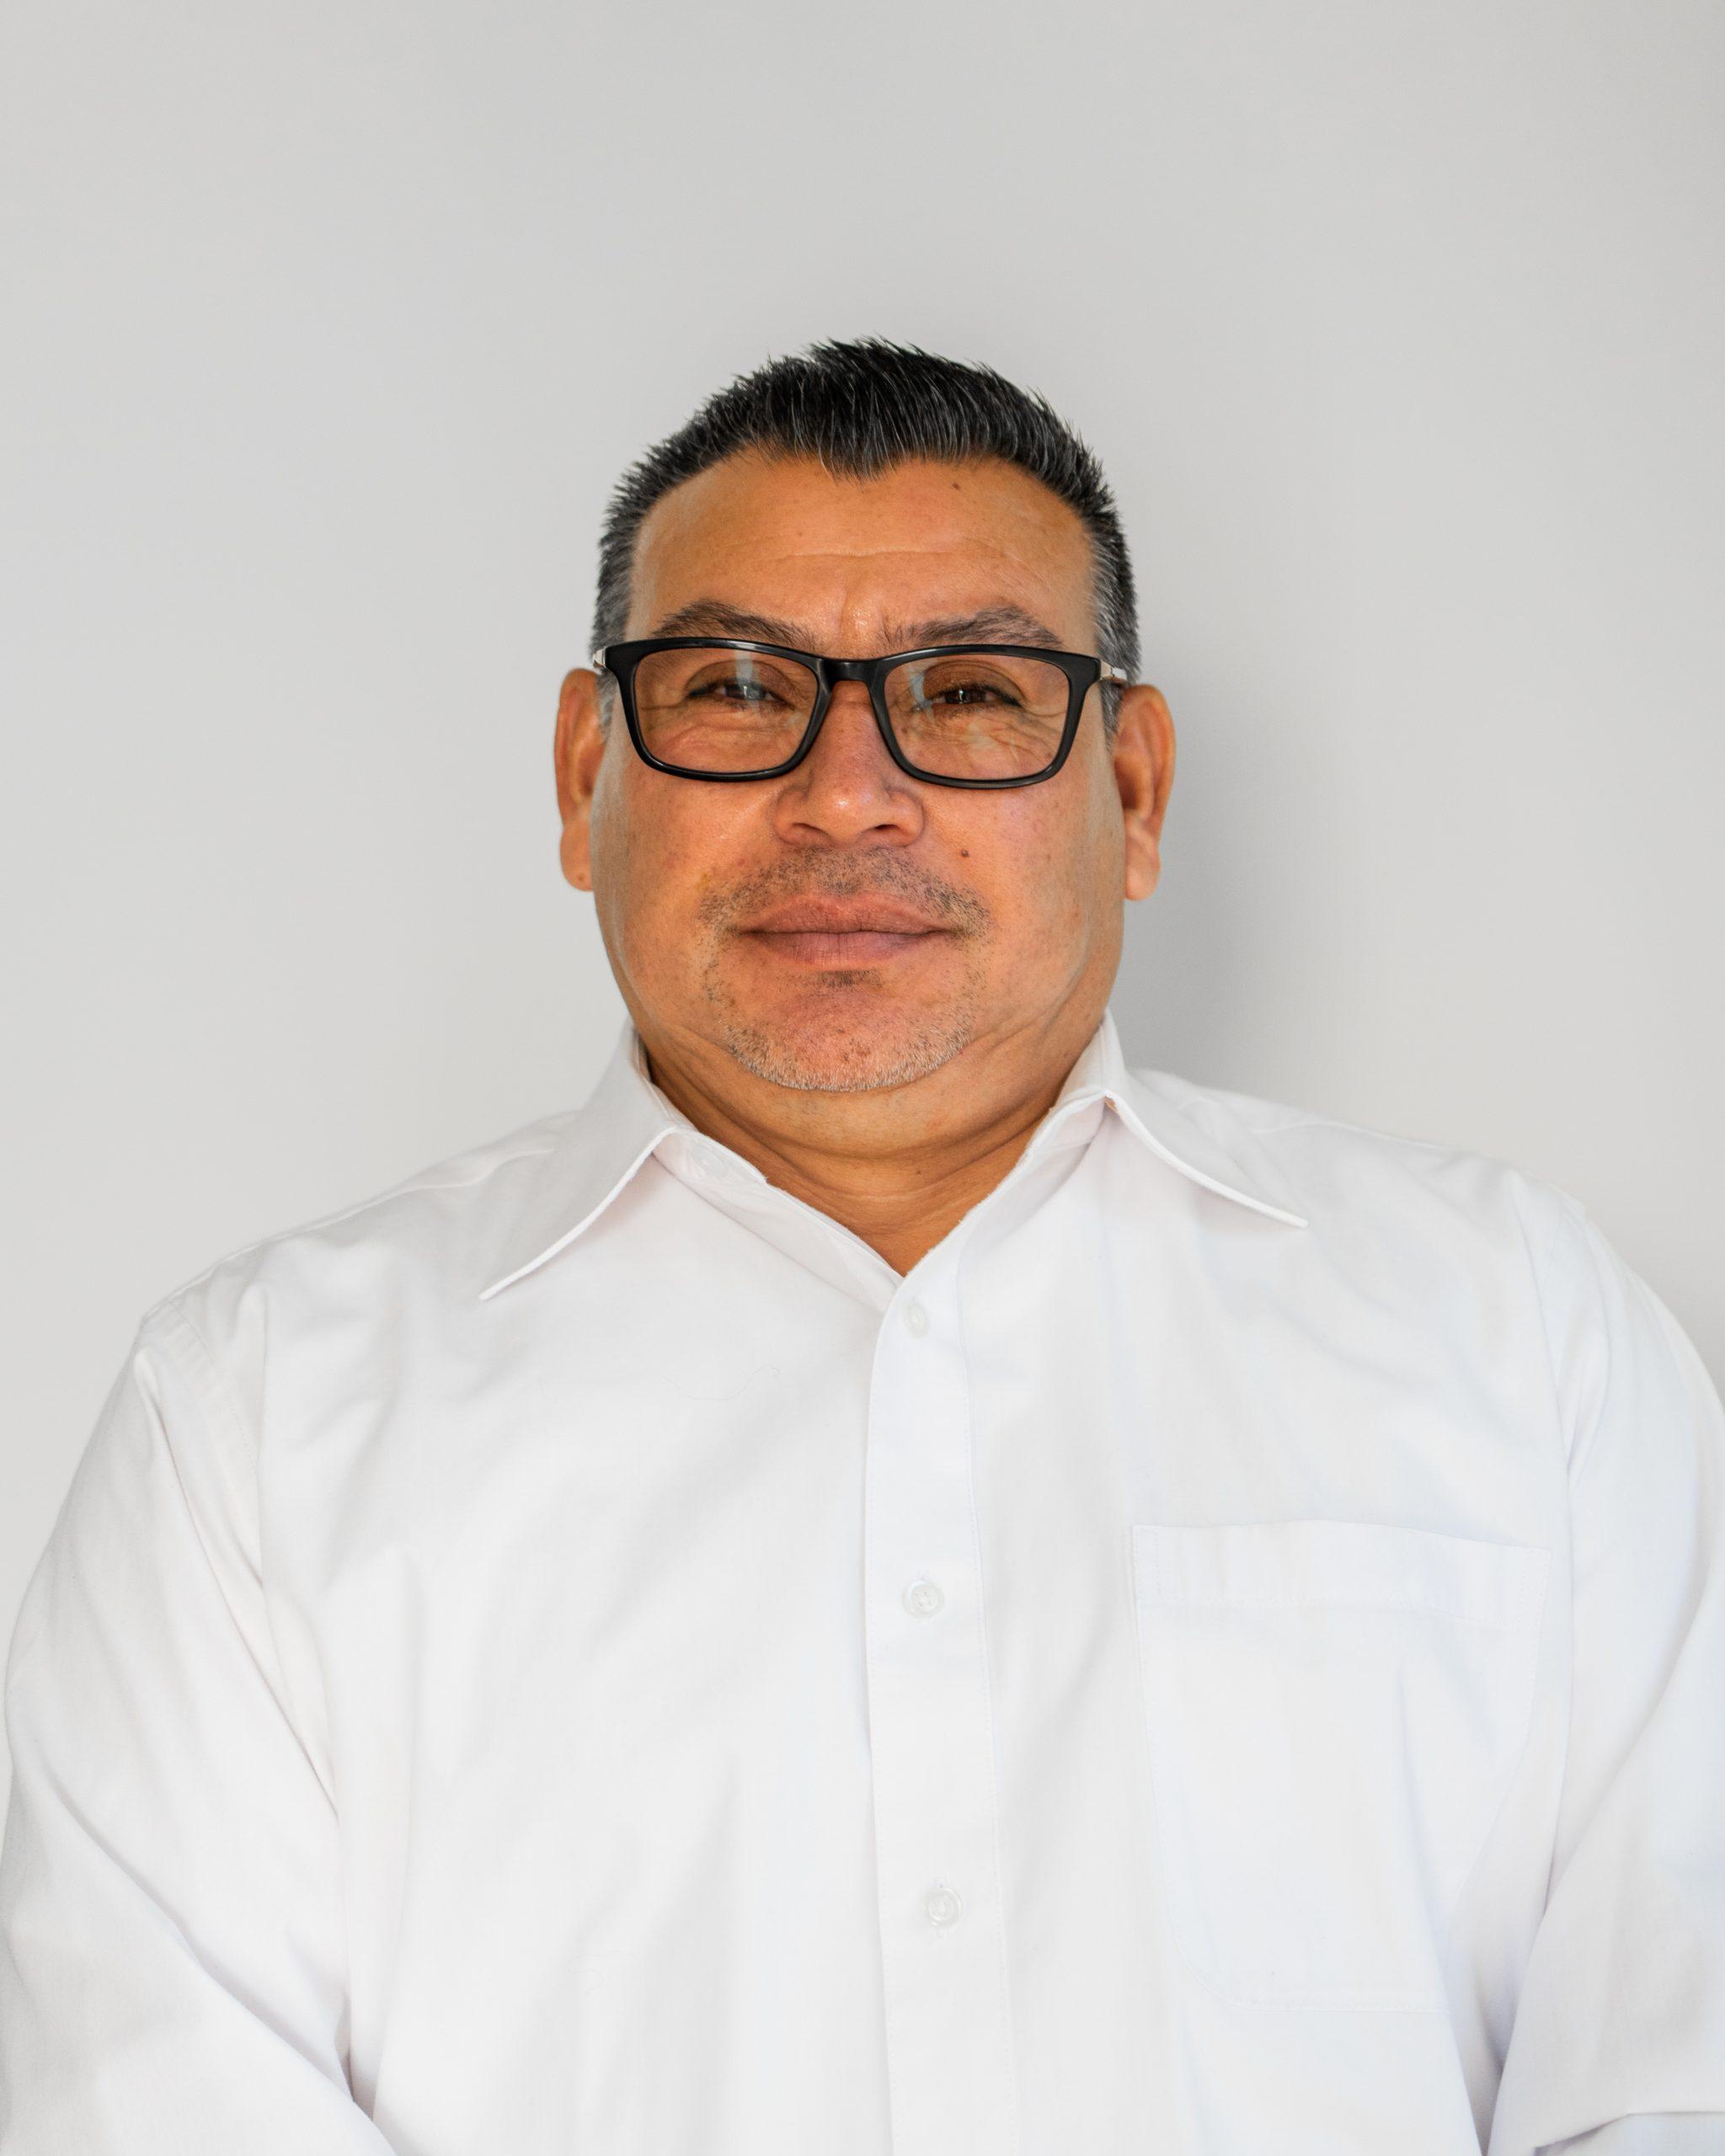 Pedro Bernal